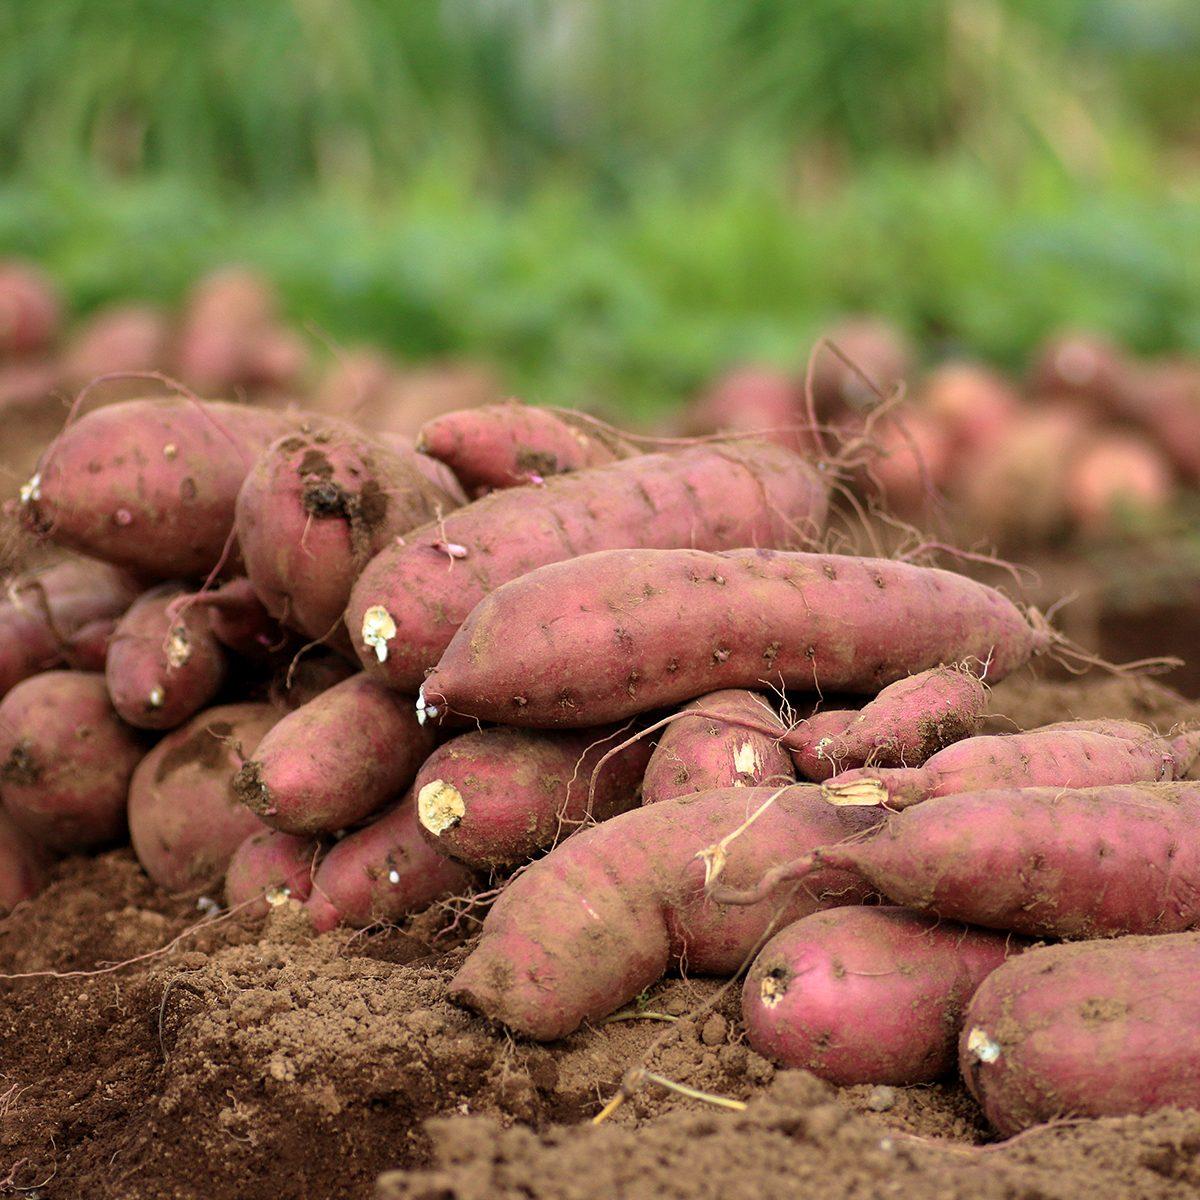 Harvesting sweet potatoes